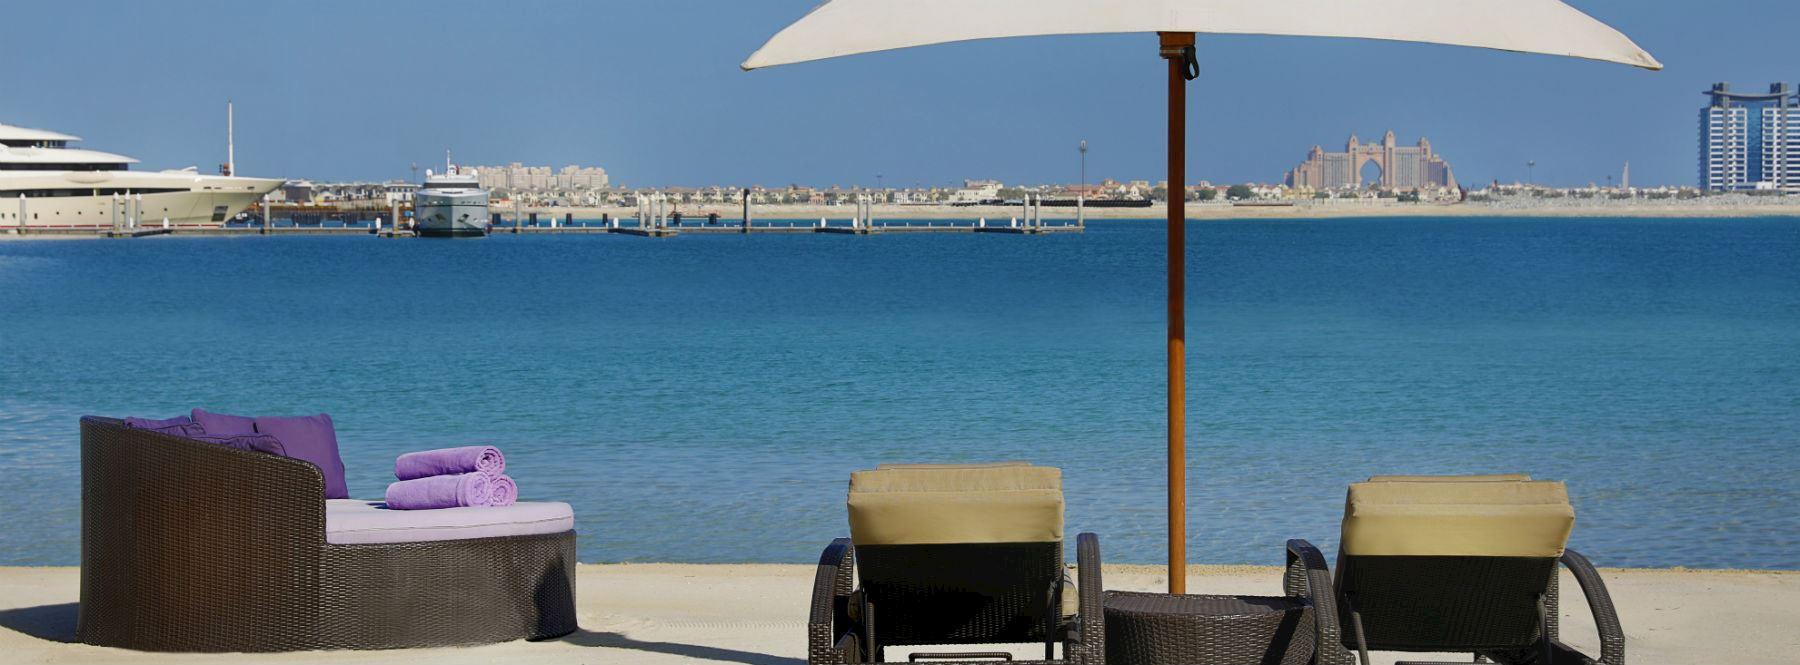 Meridien Mina Pool and Beach